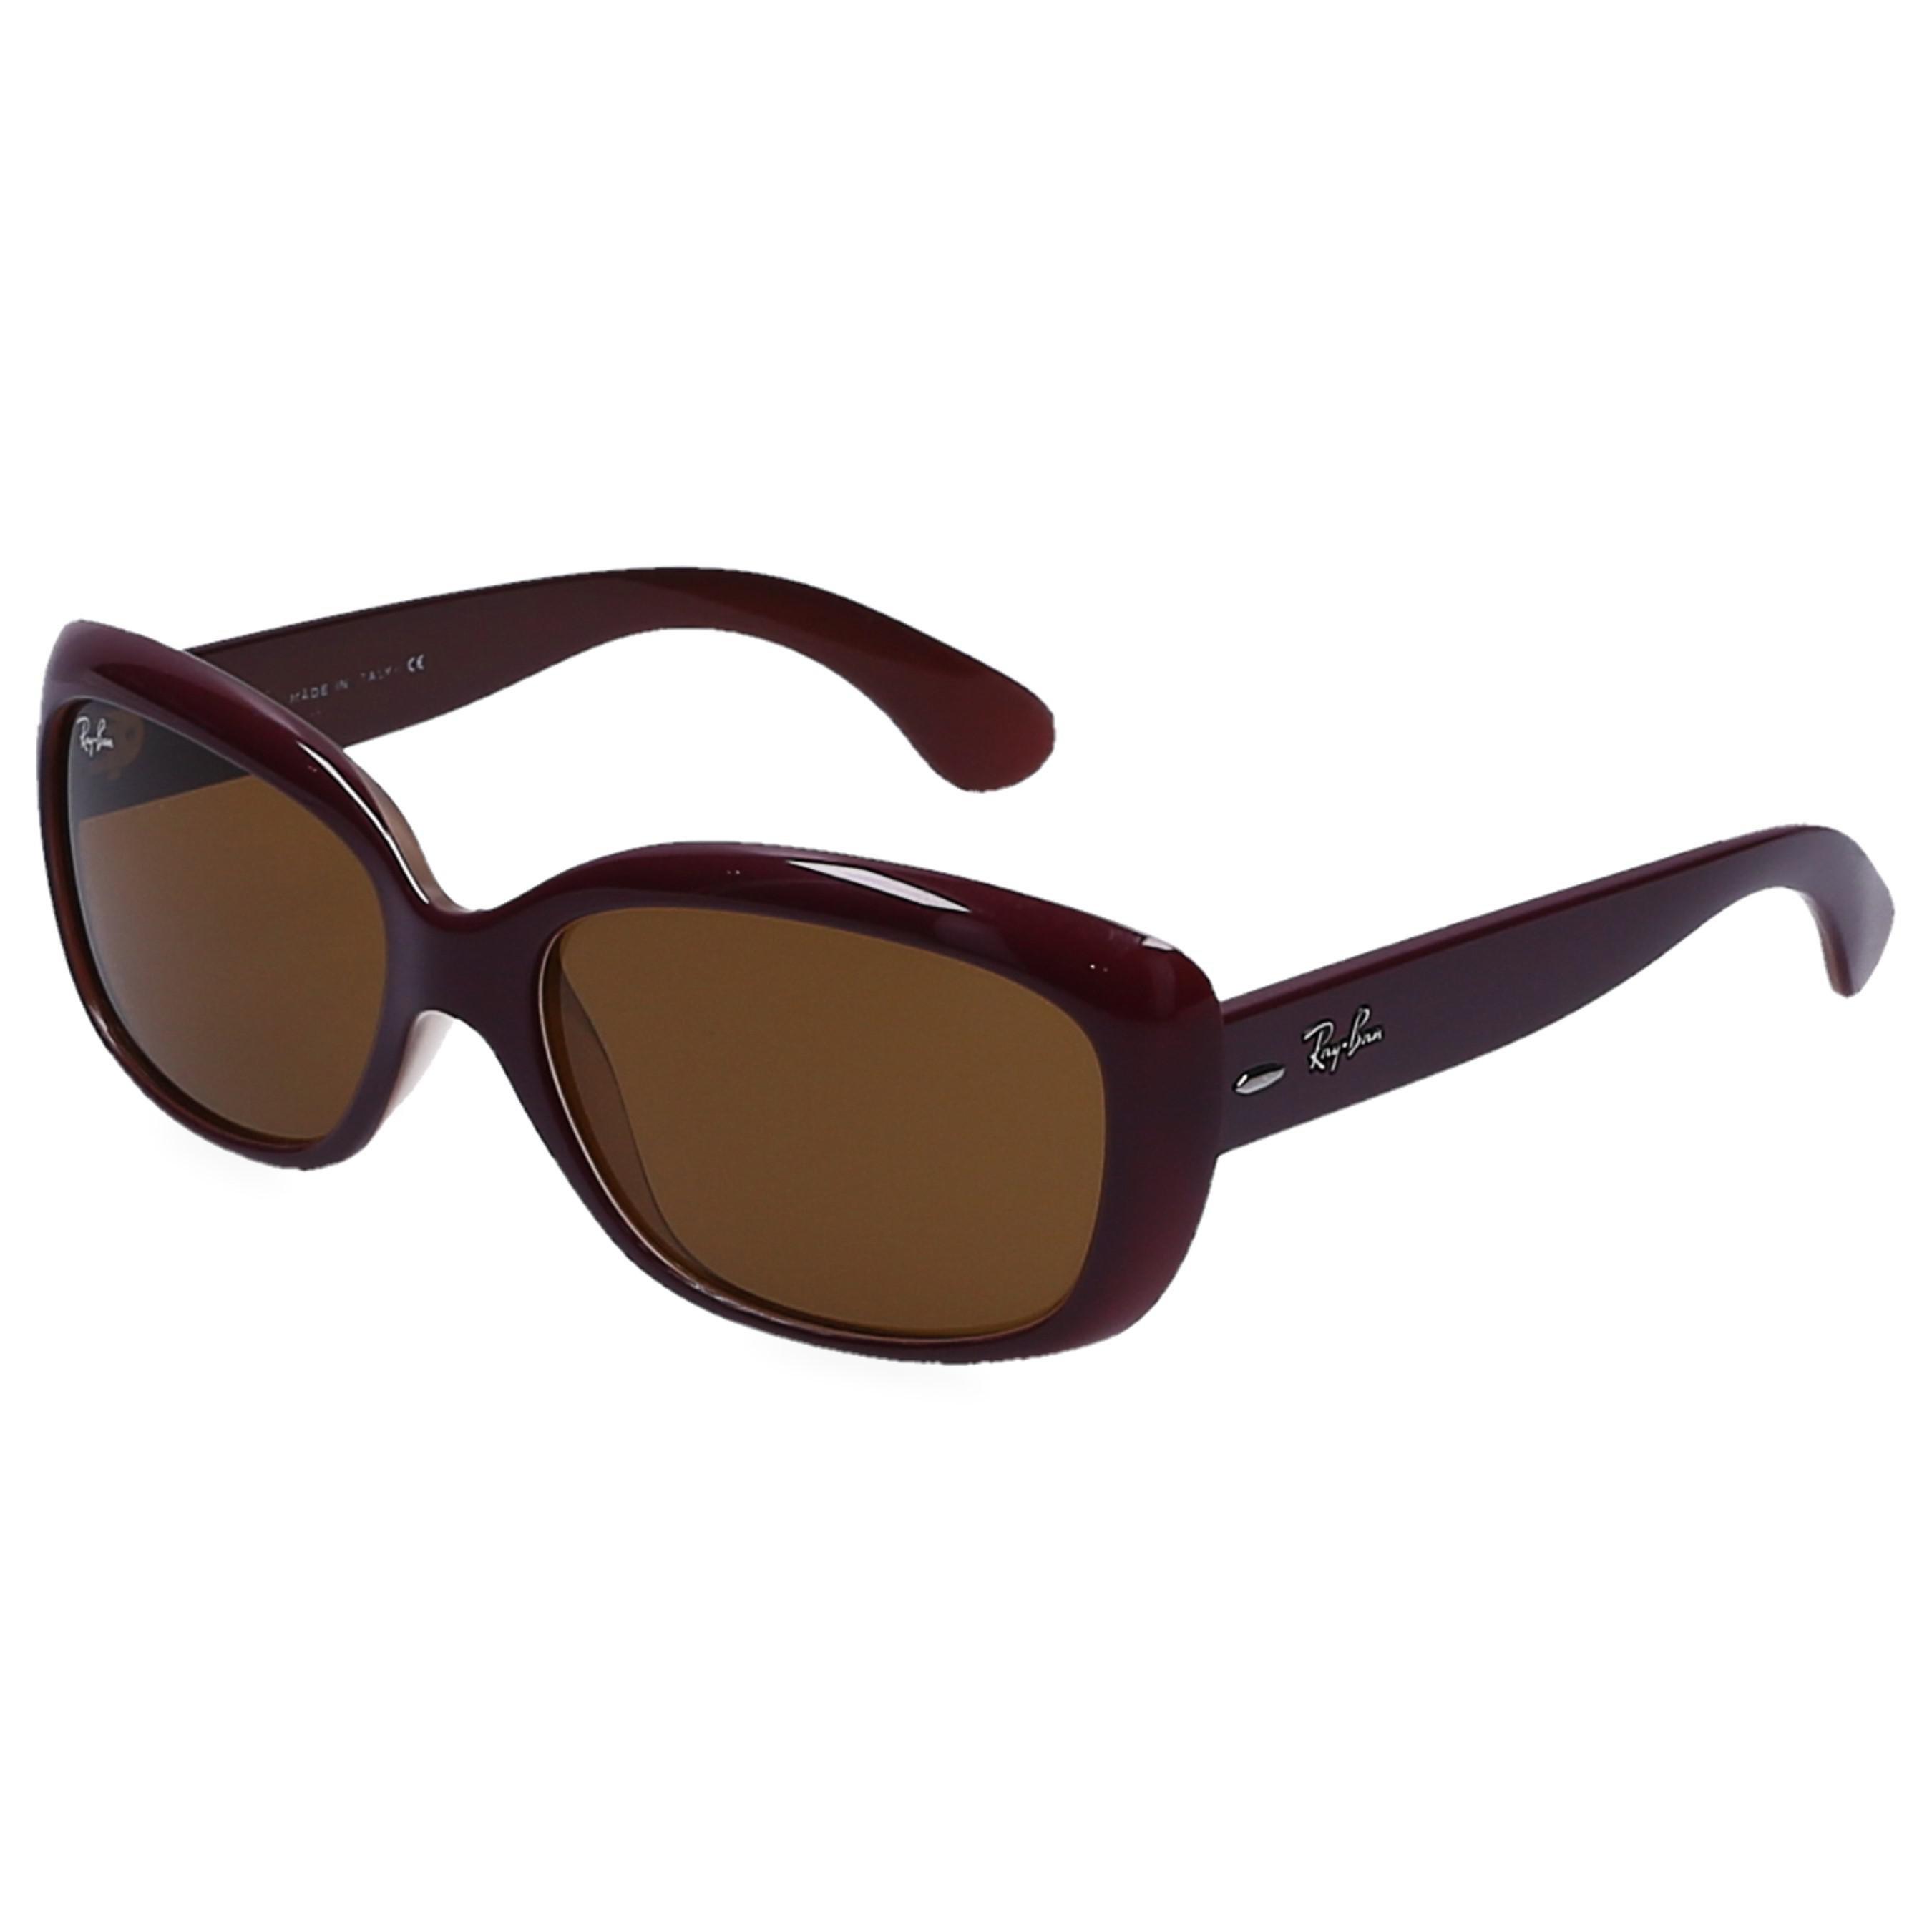 7e100dd316a Ray-Ban - Brown Women Sunglasses Rectangular 4101 Nylon Bordeaux - Lyst.  View fullscreen